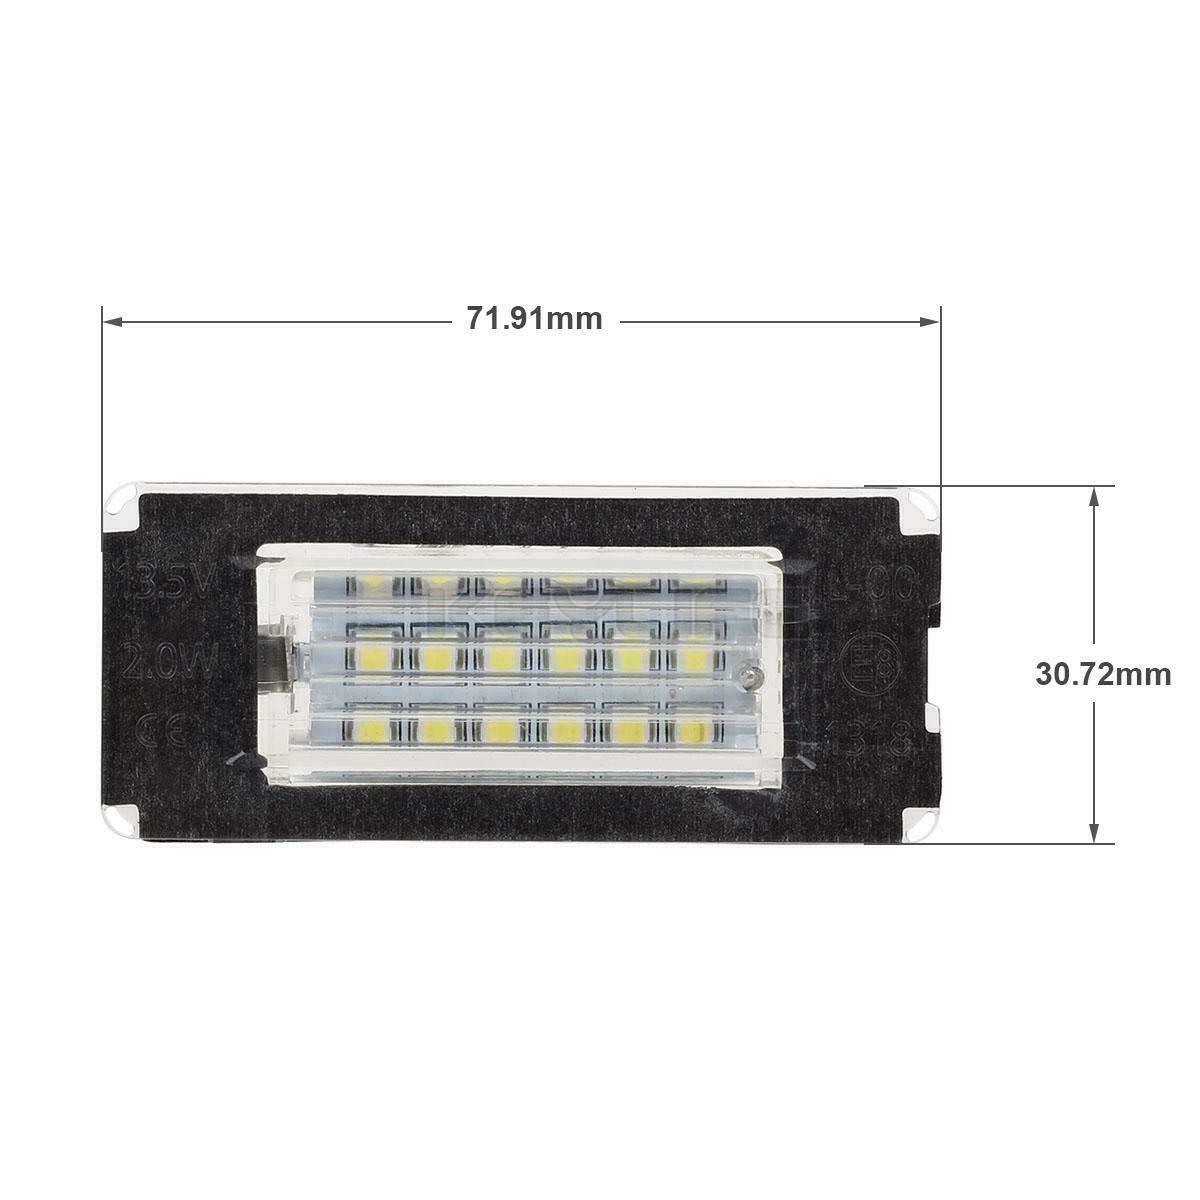 GZLMMY 2Pcs No Error LED License Plate Light Number Lamp for Mini Cooper R56 R57 R58 R59 White